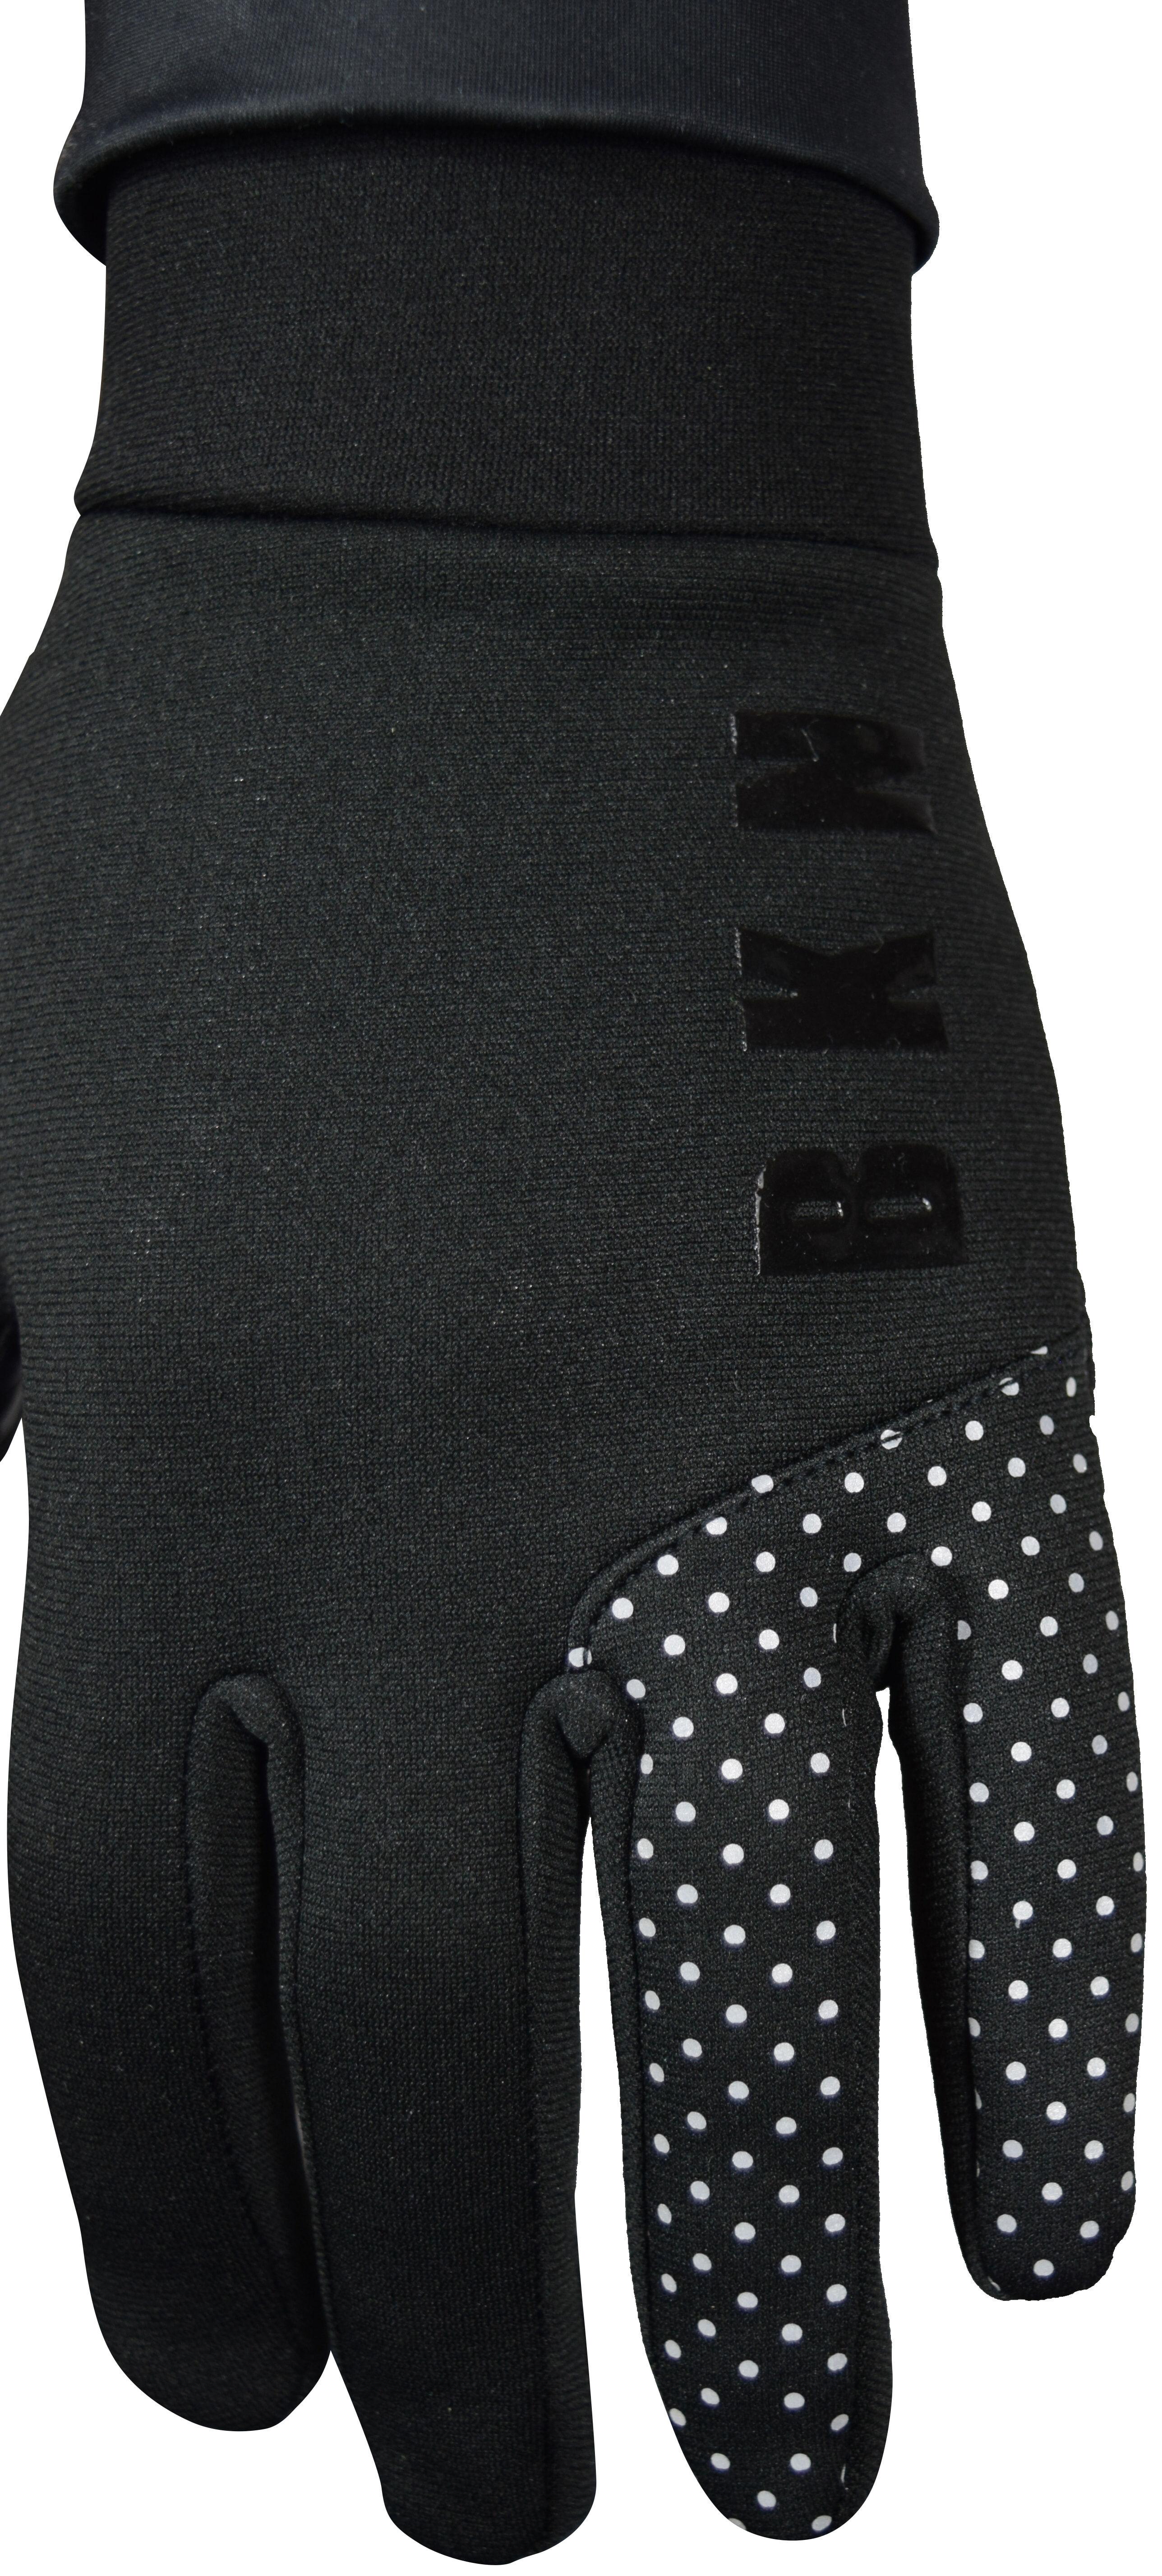 Winter Glove Close Up 1A (1)